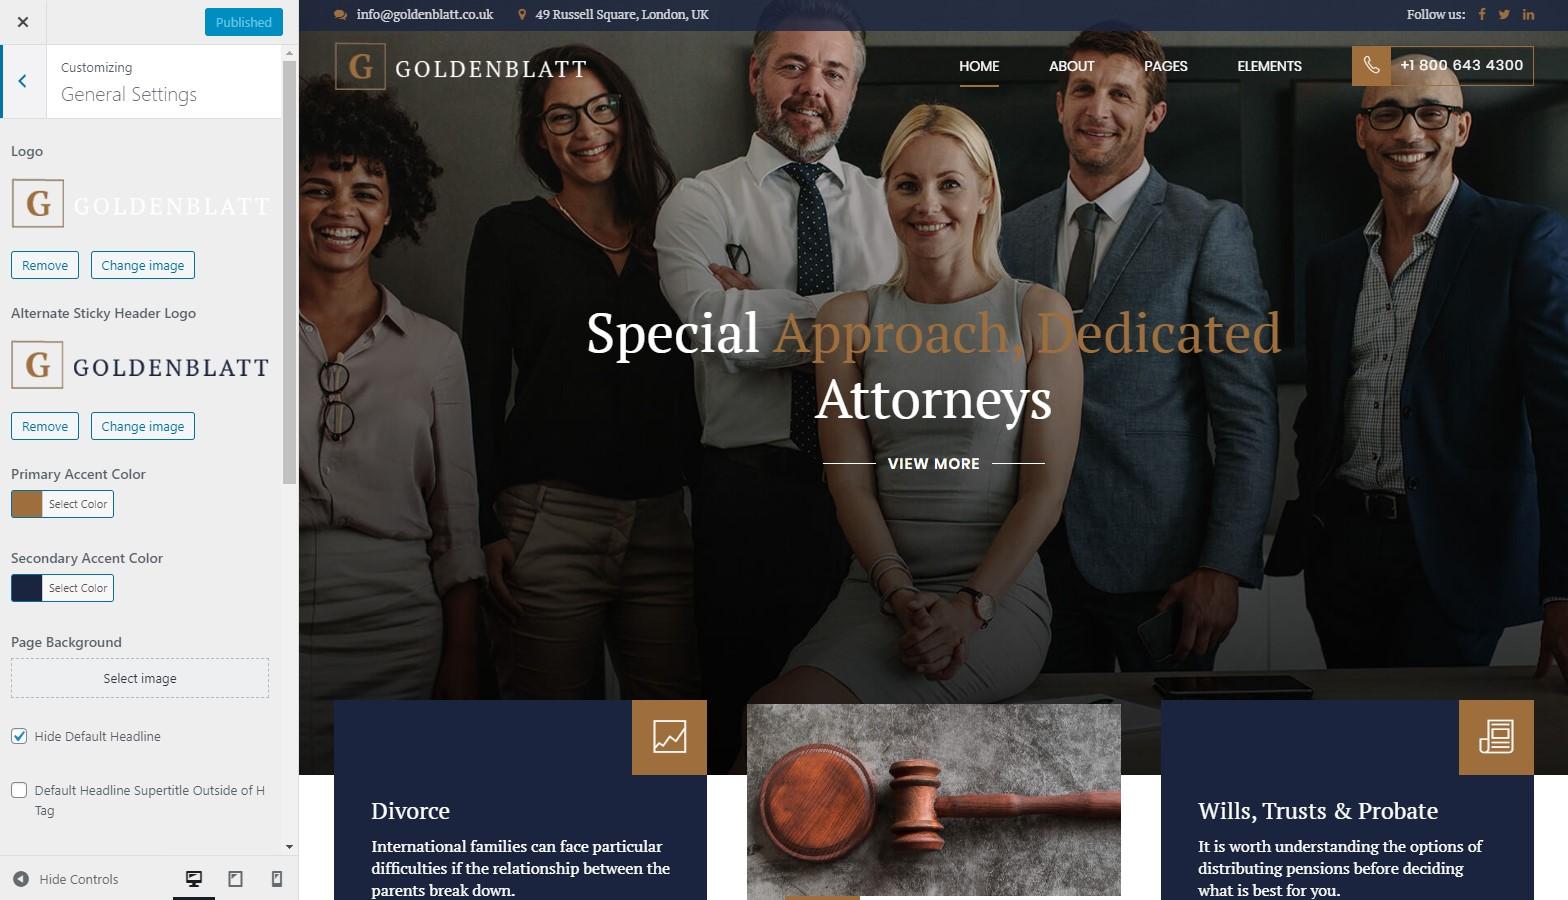 https://documentation.bold-themes.com/goldenblatt/wp-content/uploads/sites/51/2019/11/general-settings.jpg